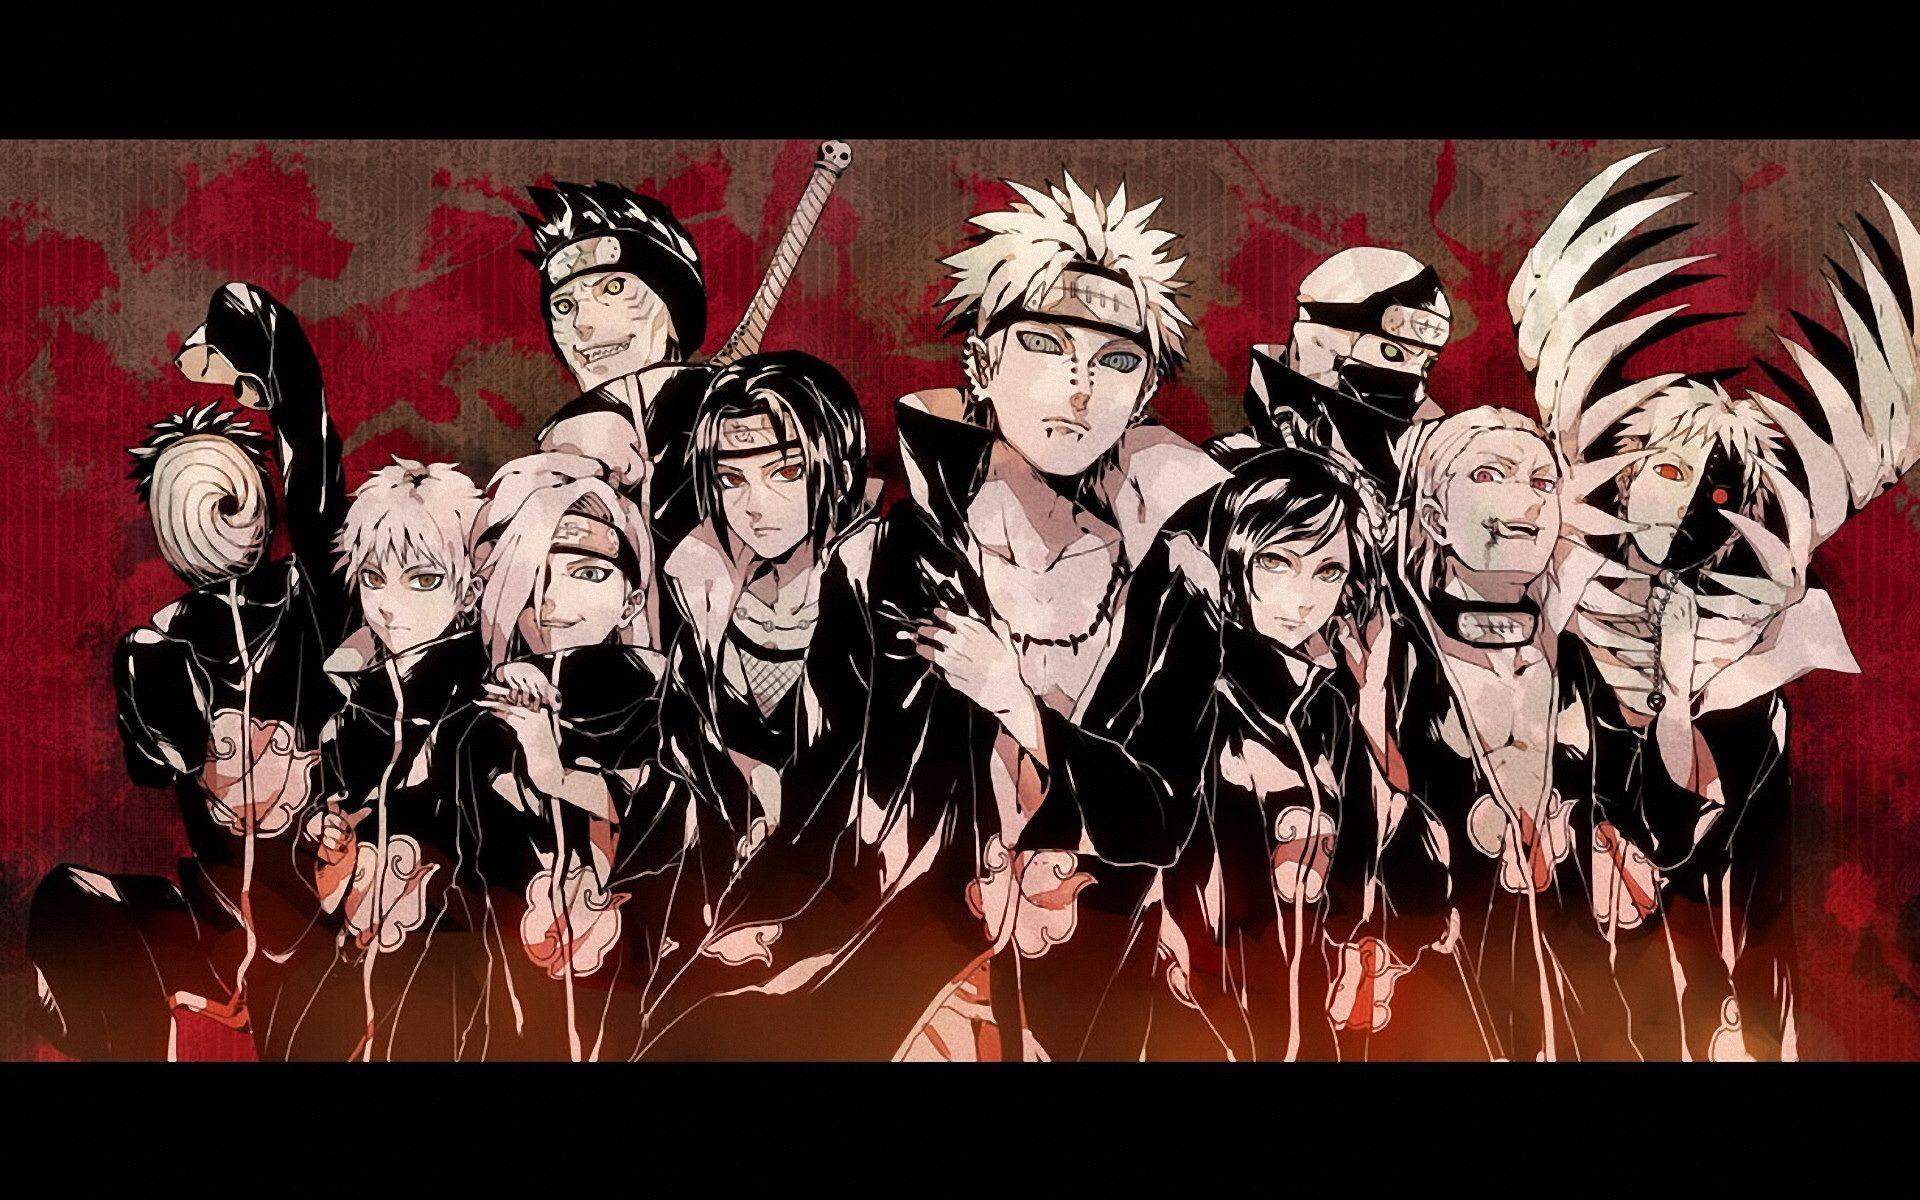 Beautiful Wallpaper Naruto Akatsuki - 36e2994a0d2fc09c3d644a38b94ba3ca  Pic_40911.jpg